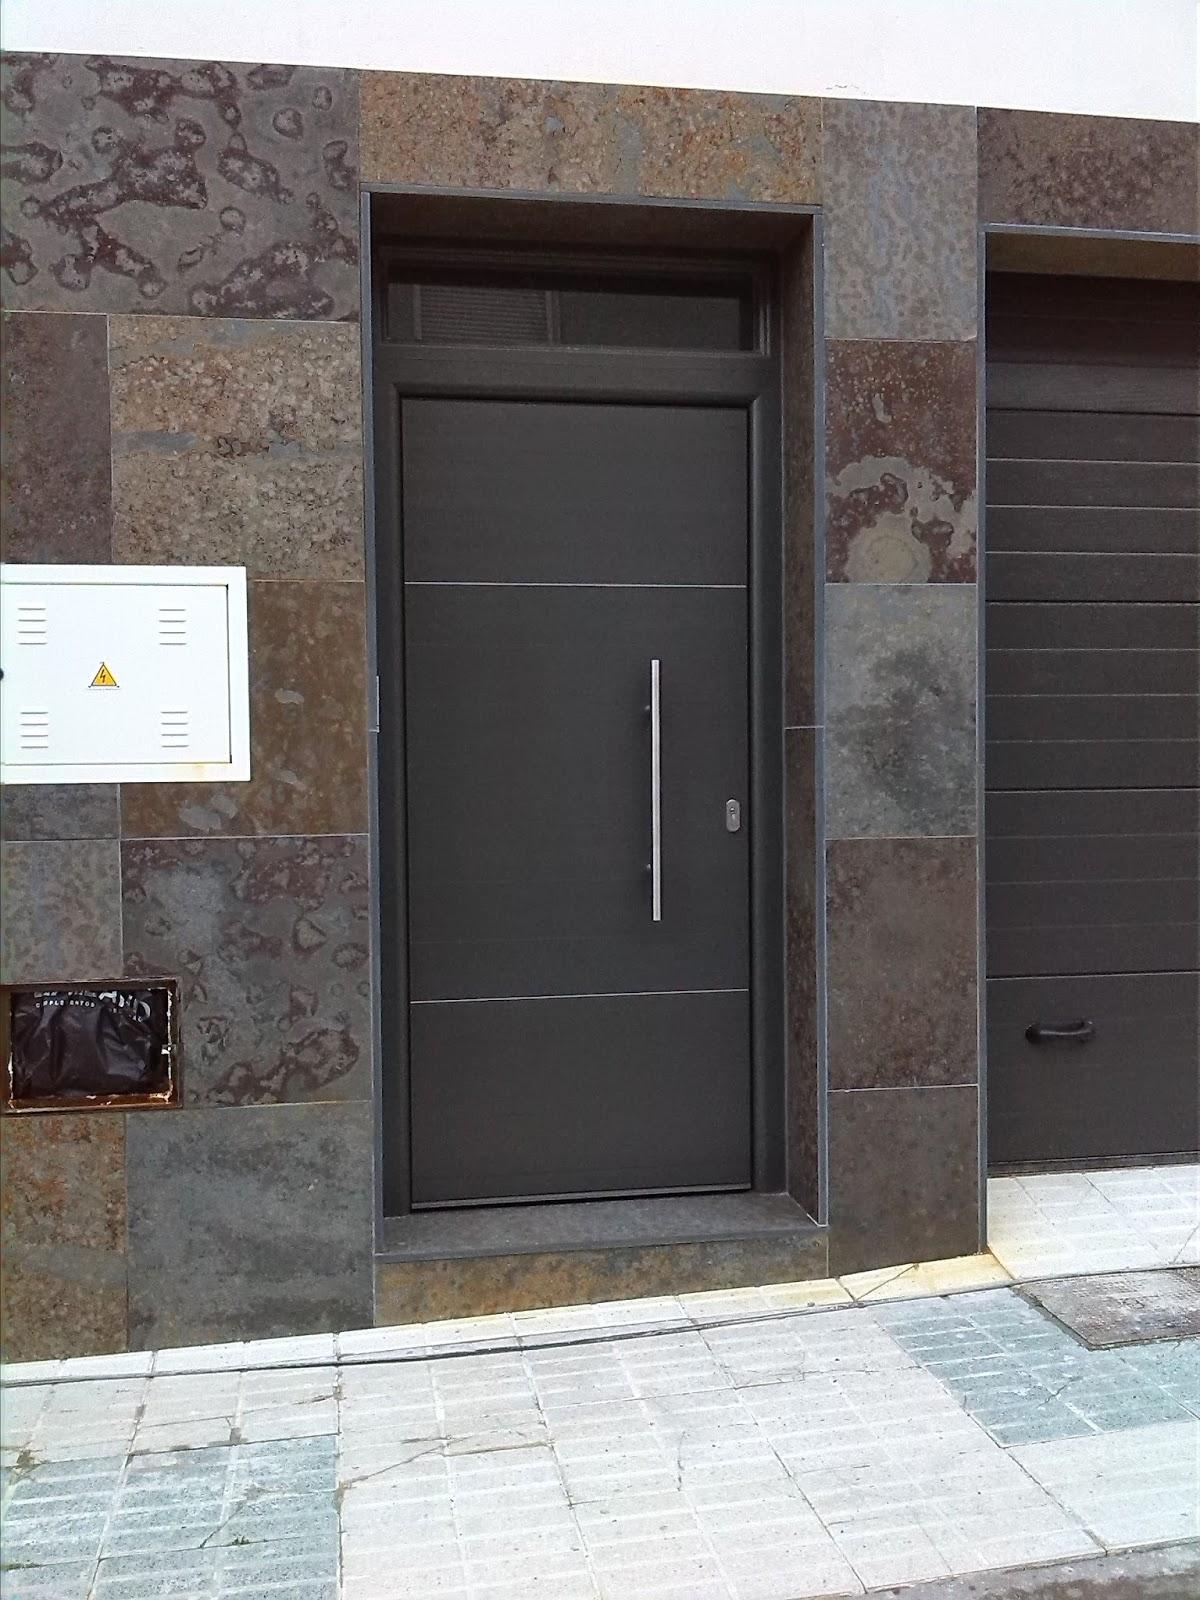 Aluminios de andalucia puertas blindadas imitaci n madera - Puertas blindadas a medida ...